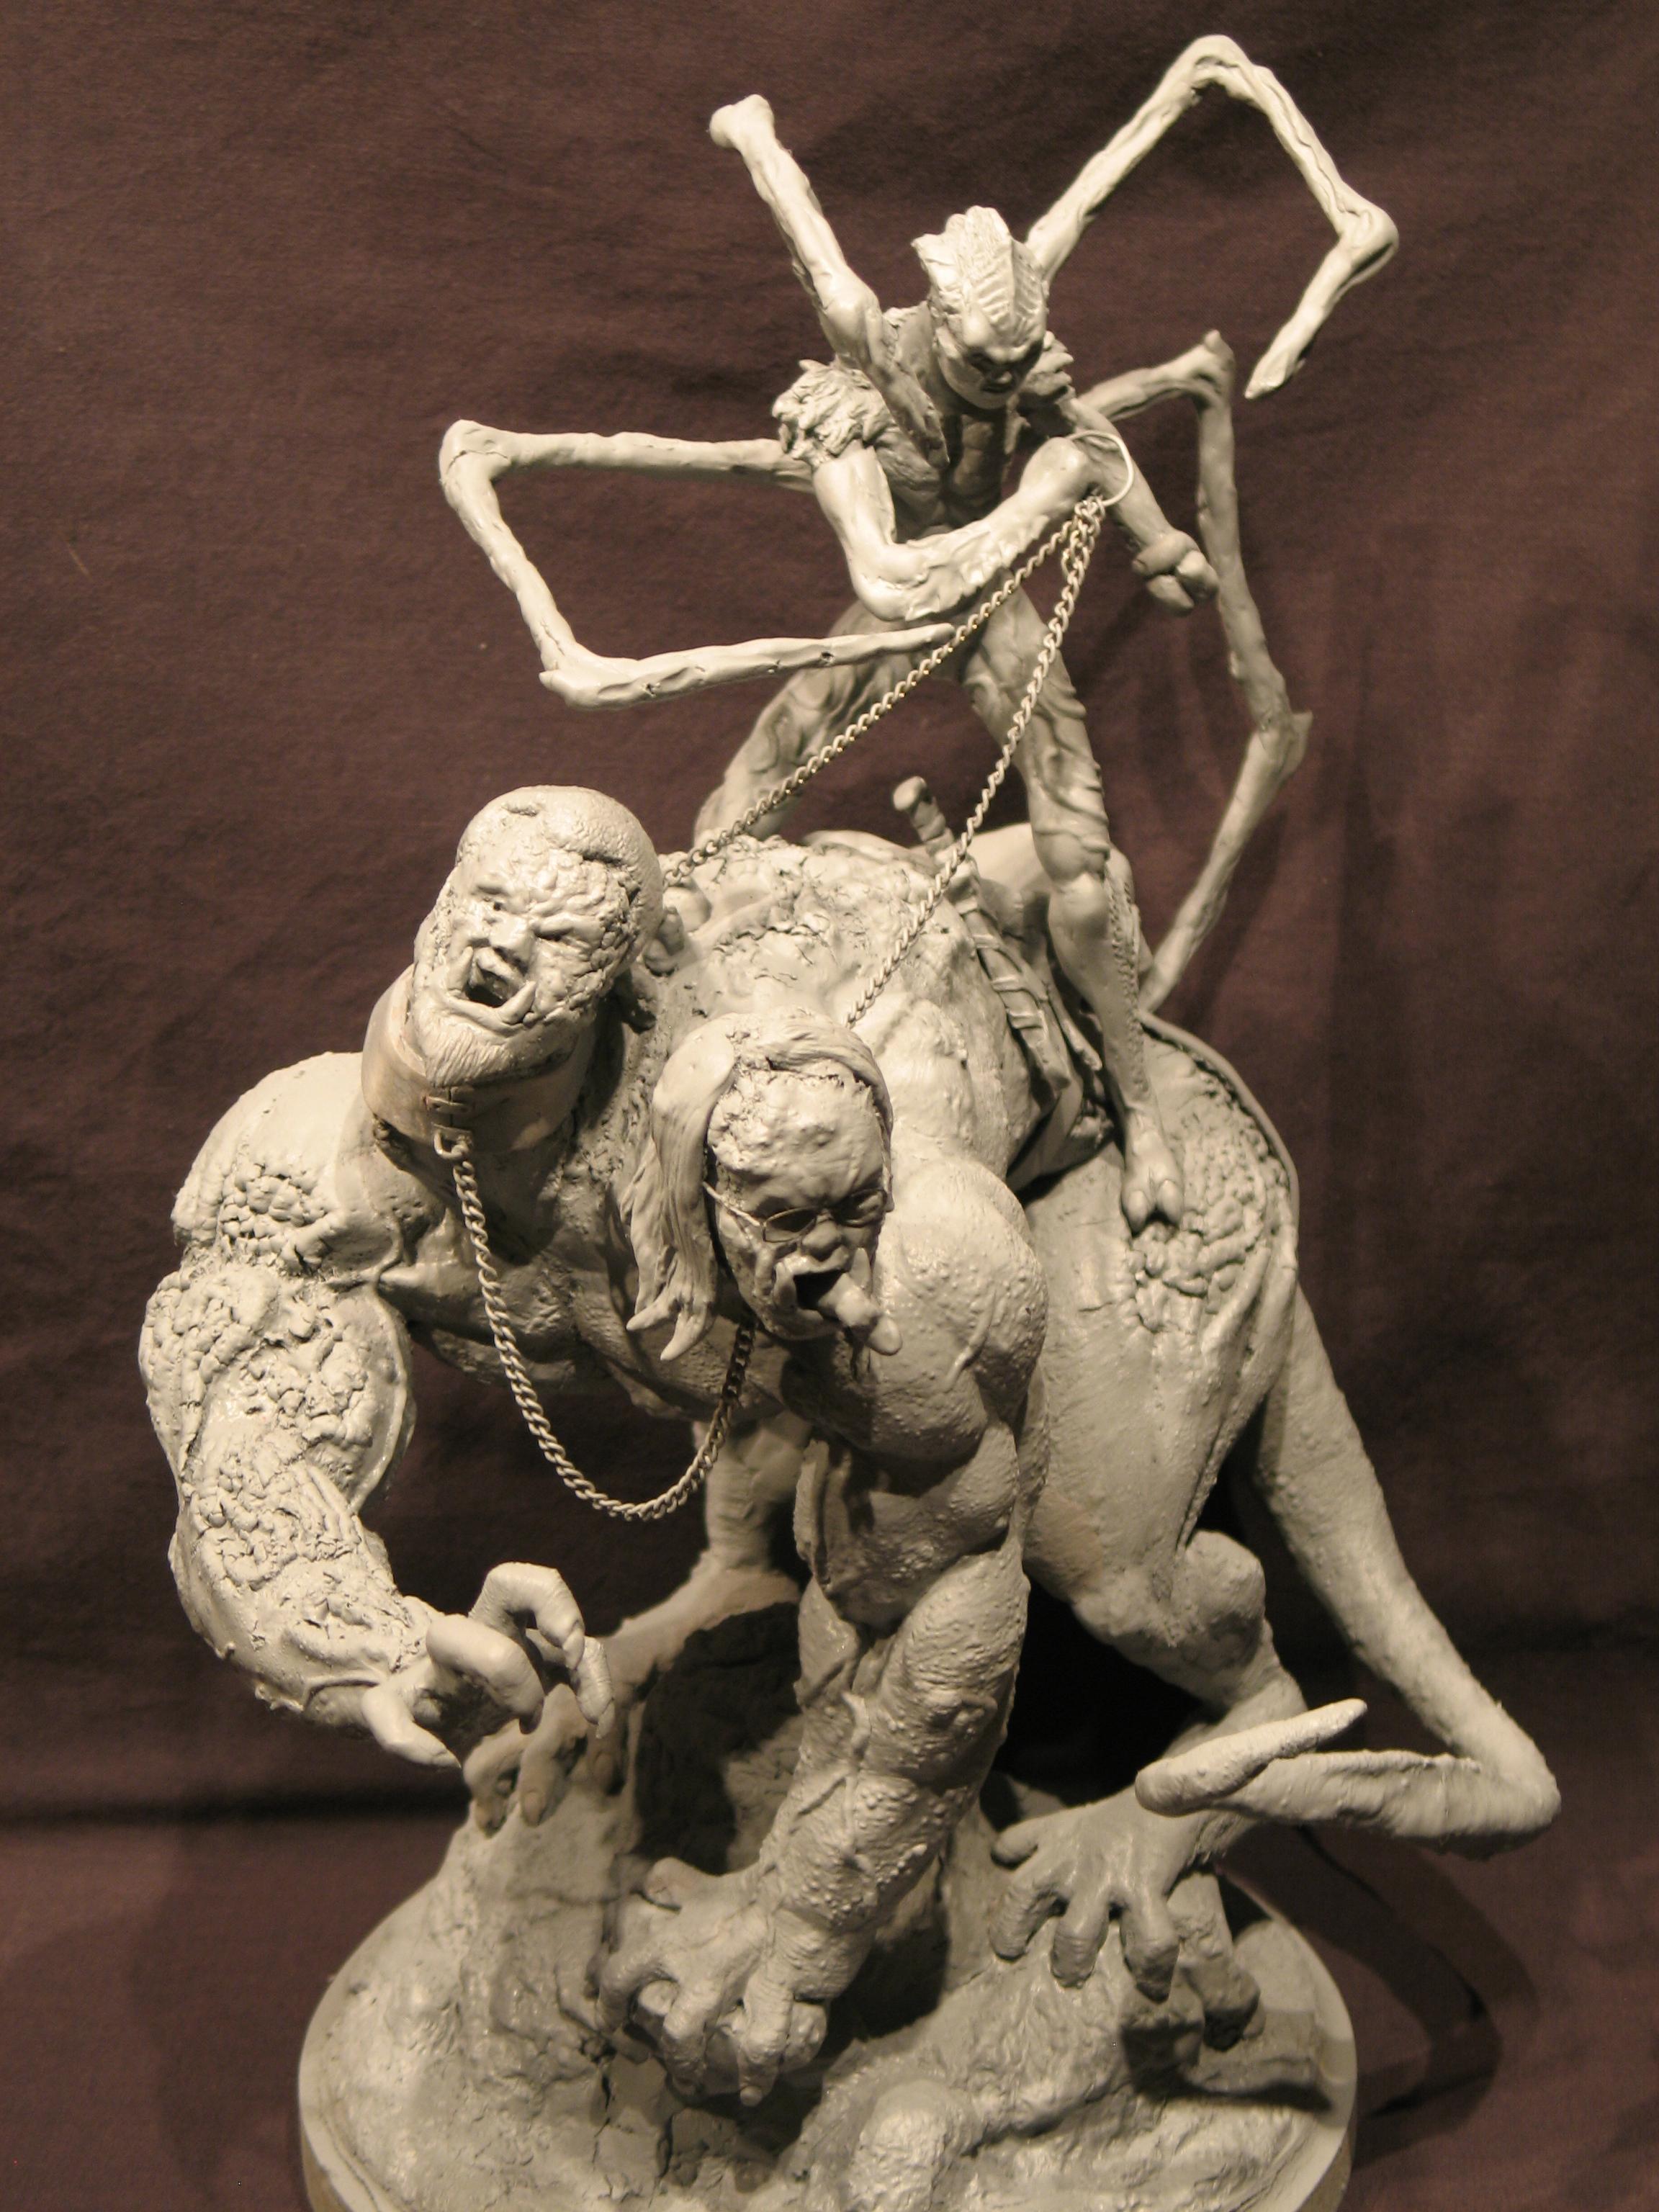 Spiderzero Riding the Shiflett Monster (Concours Shiflett 2) S139l